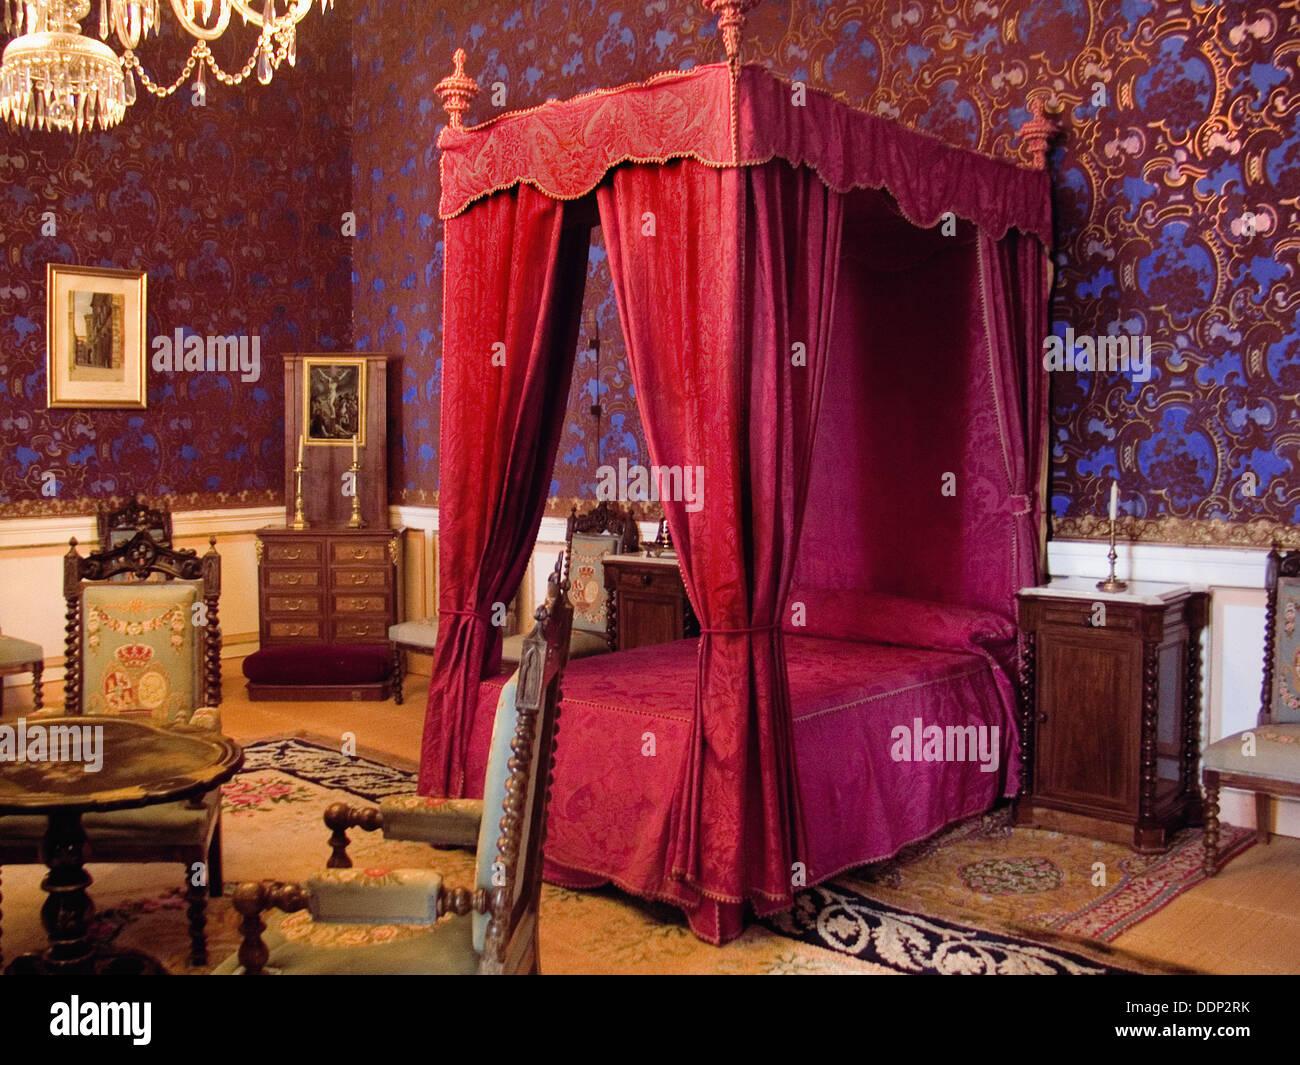 Bed. Royal Palace of Riofrío. Segovia province, Castilla-León. Spain Stock Photo